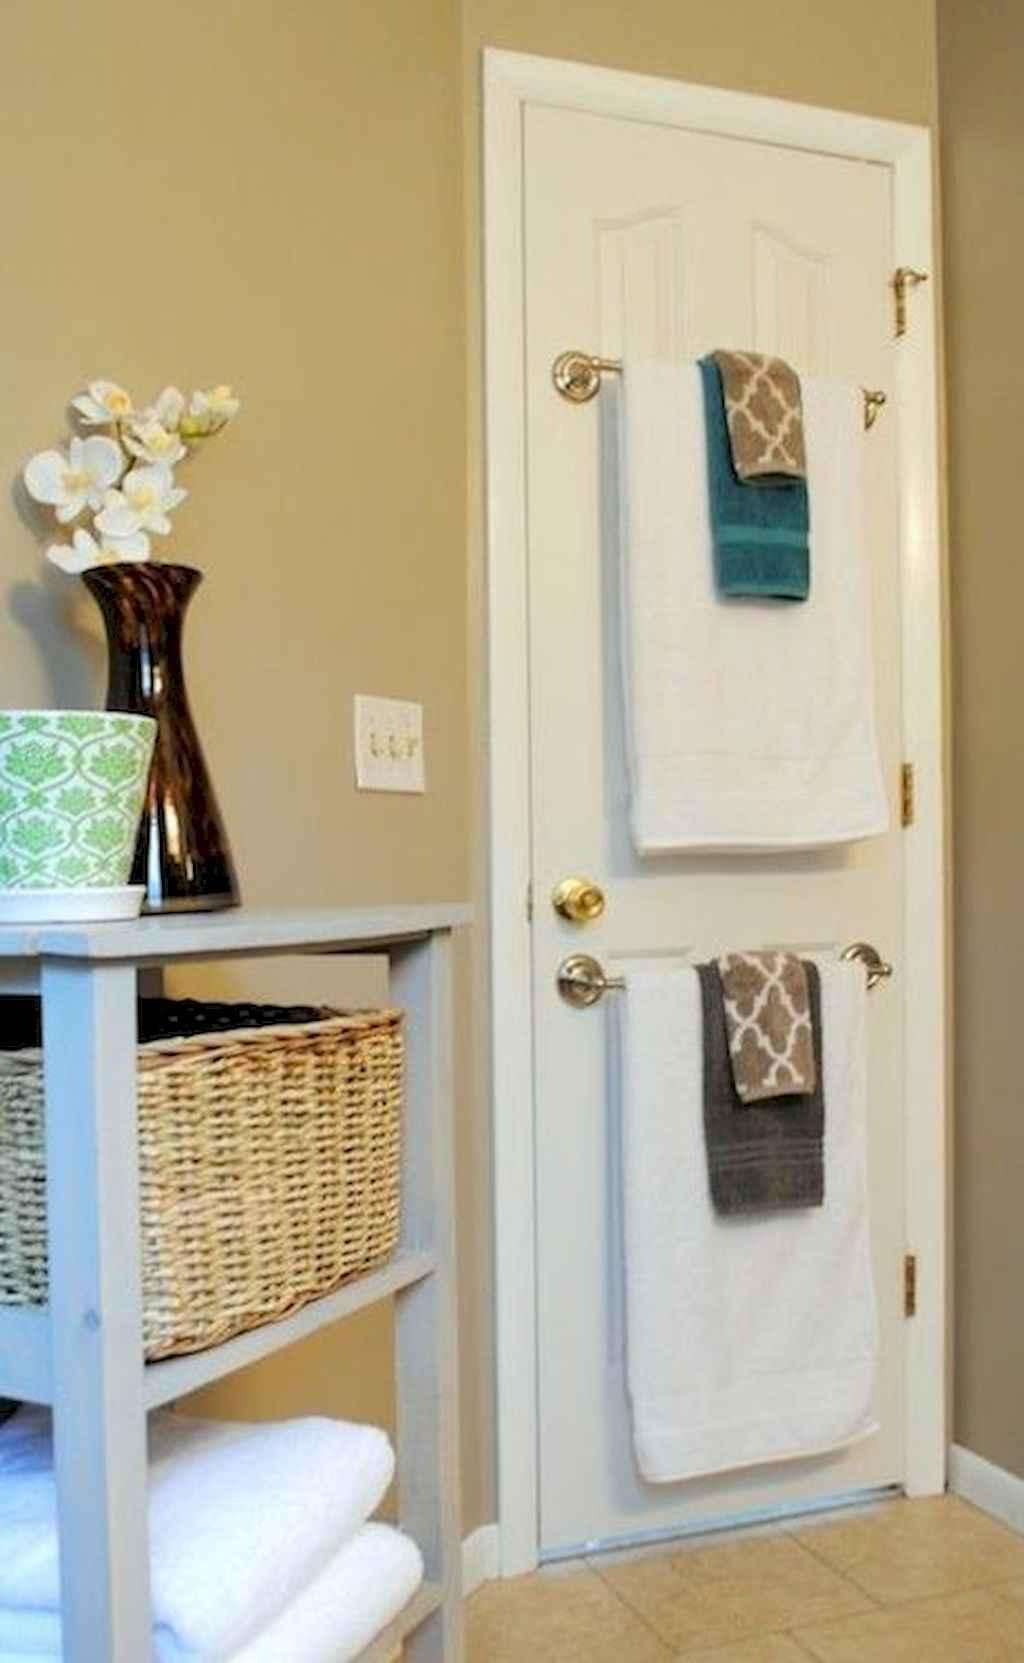 111 Brilliant Small Bathroom Remodel Ideas On A Budget (44)